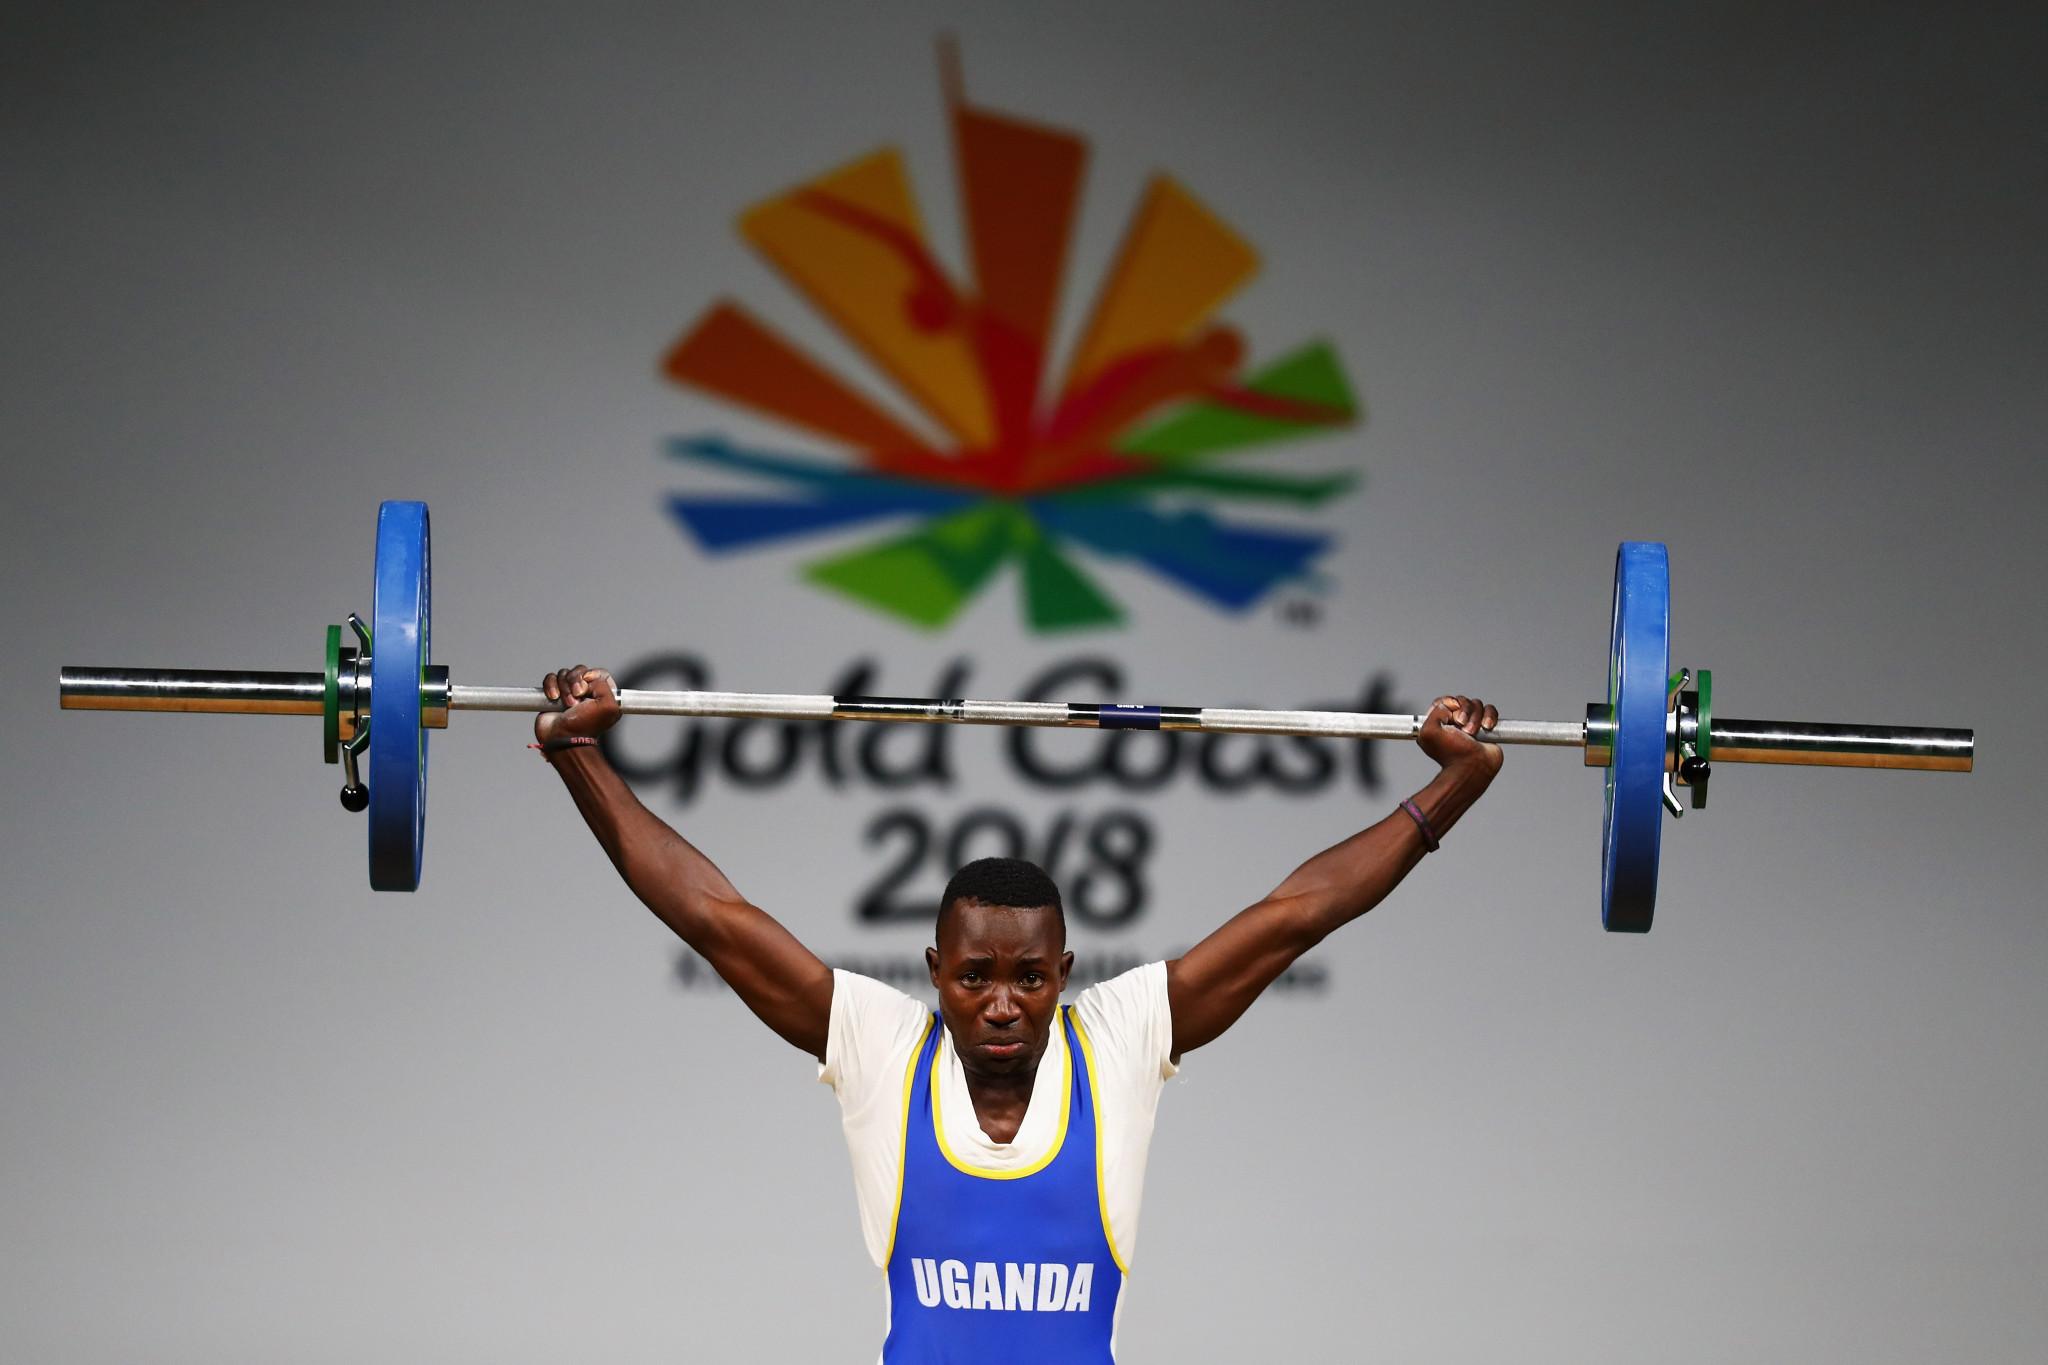 Missing Ugandan weightlifter reportedly spotted in Nagoya after leaving Tokyo 2020 camp